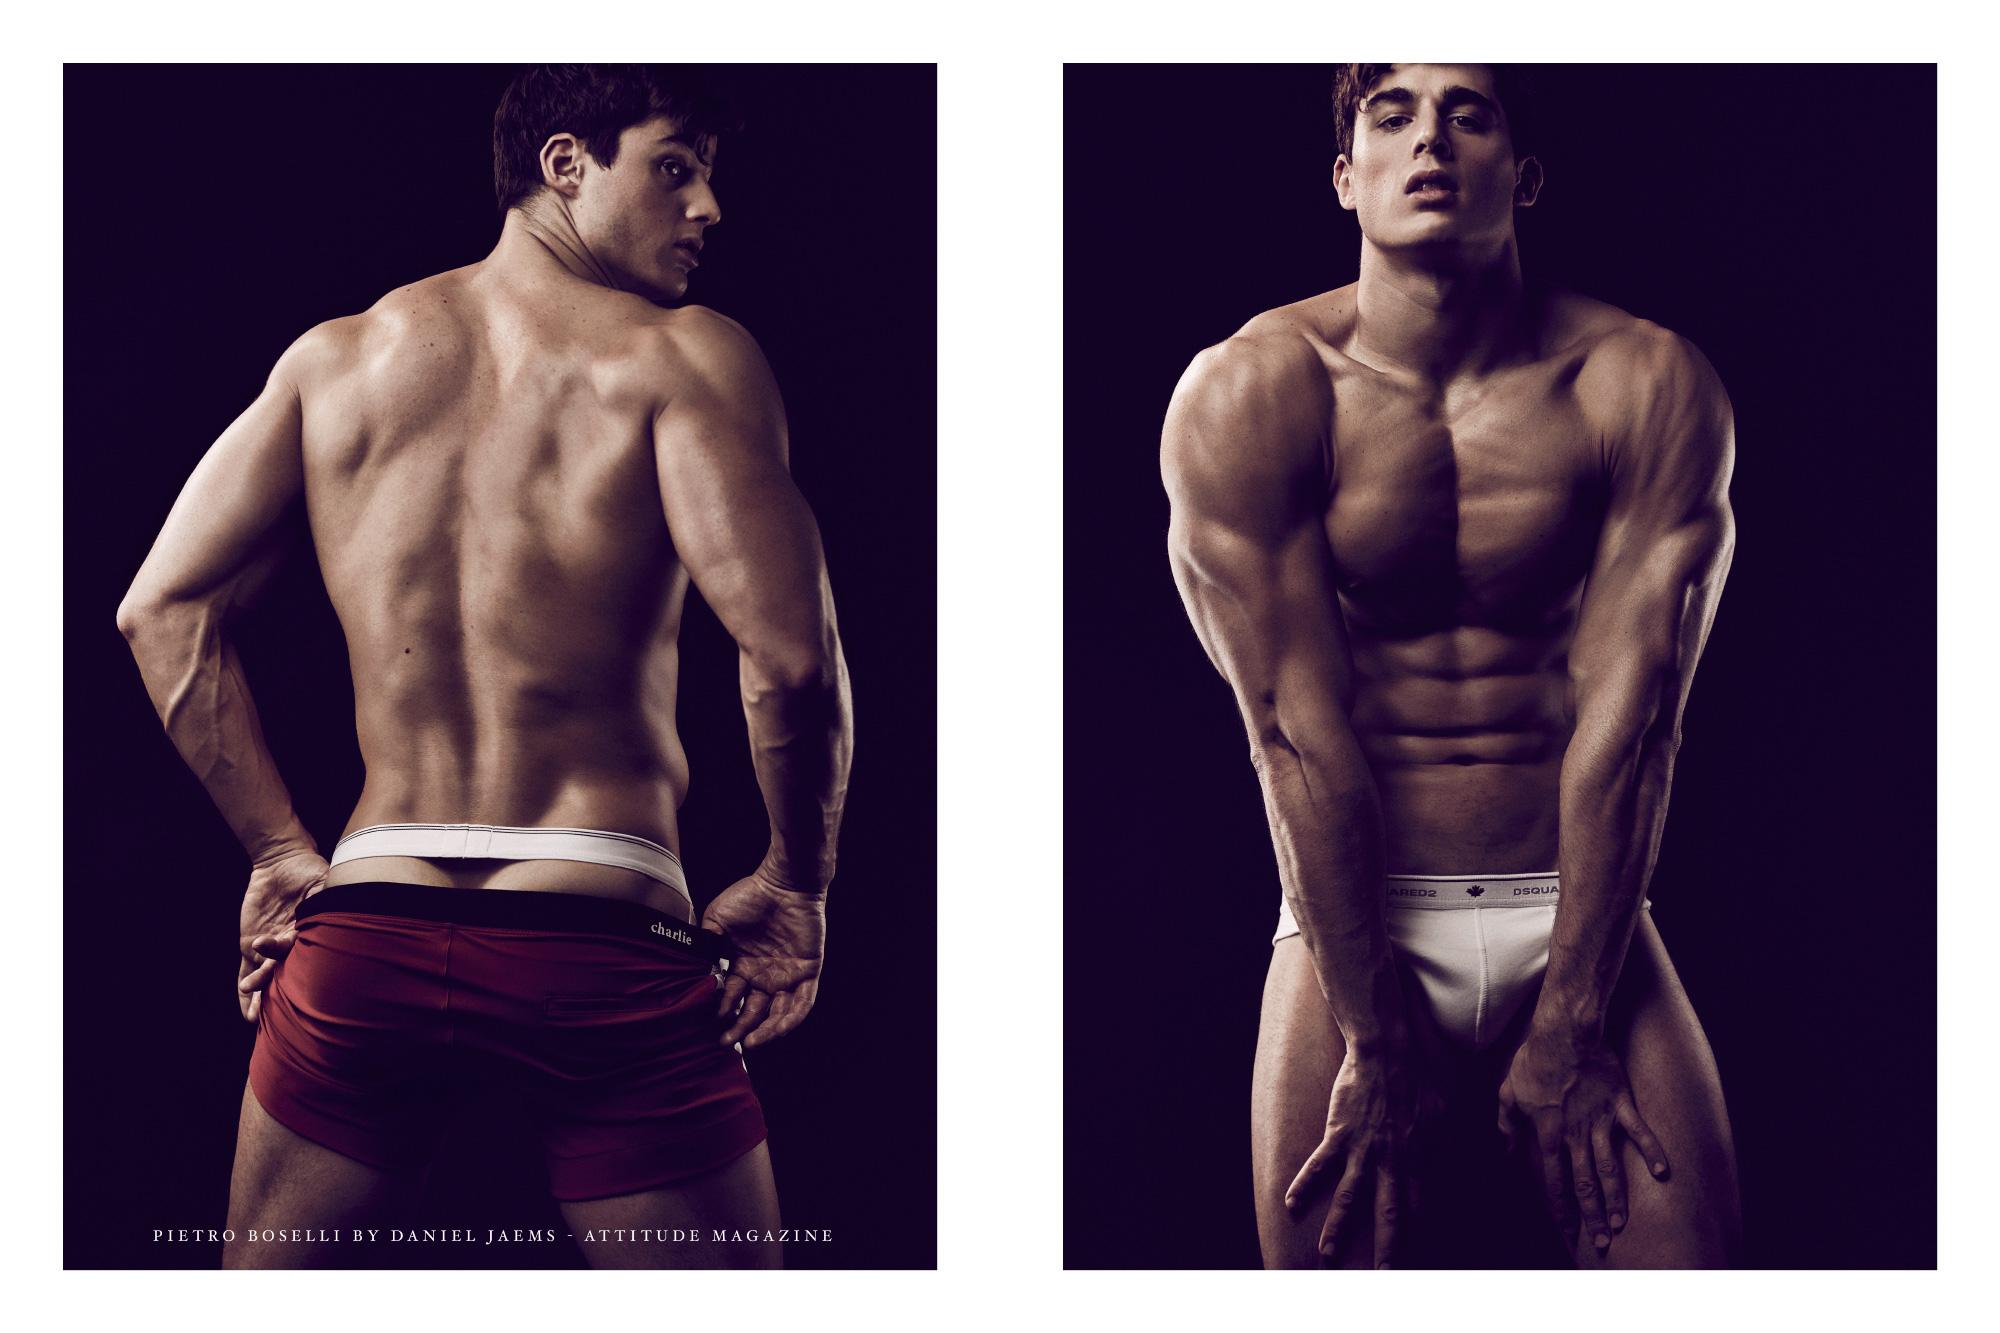 Pietro-Boselli-by-Daniel-Jaems-for-Attitude-Magazine-13